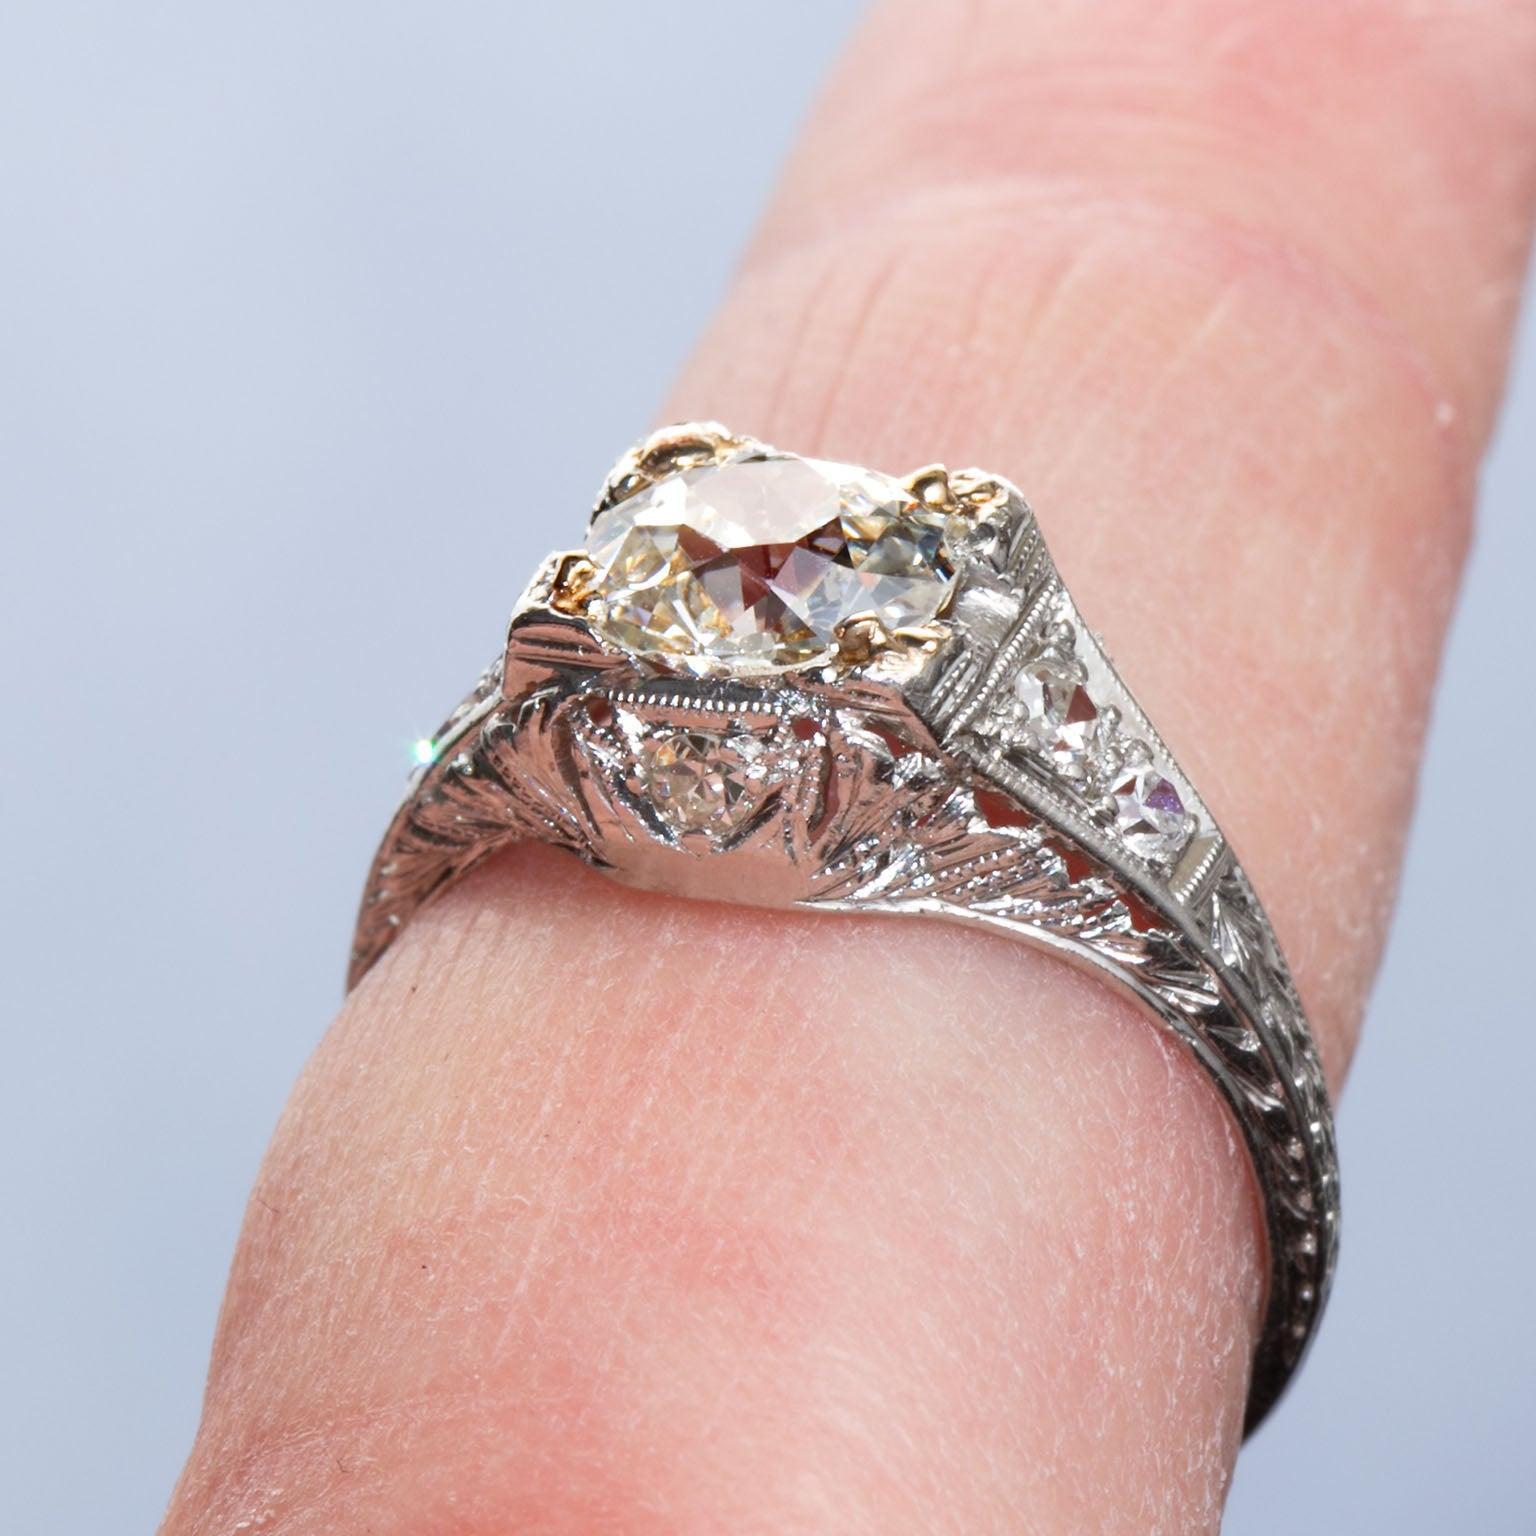 1920s 1.08 Carat Old Mine Diamond Platinum Ring For Sale at 1stdibs